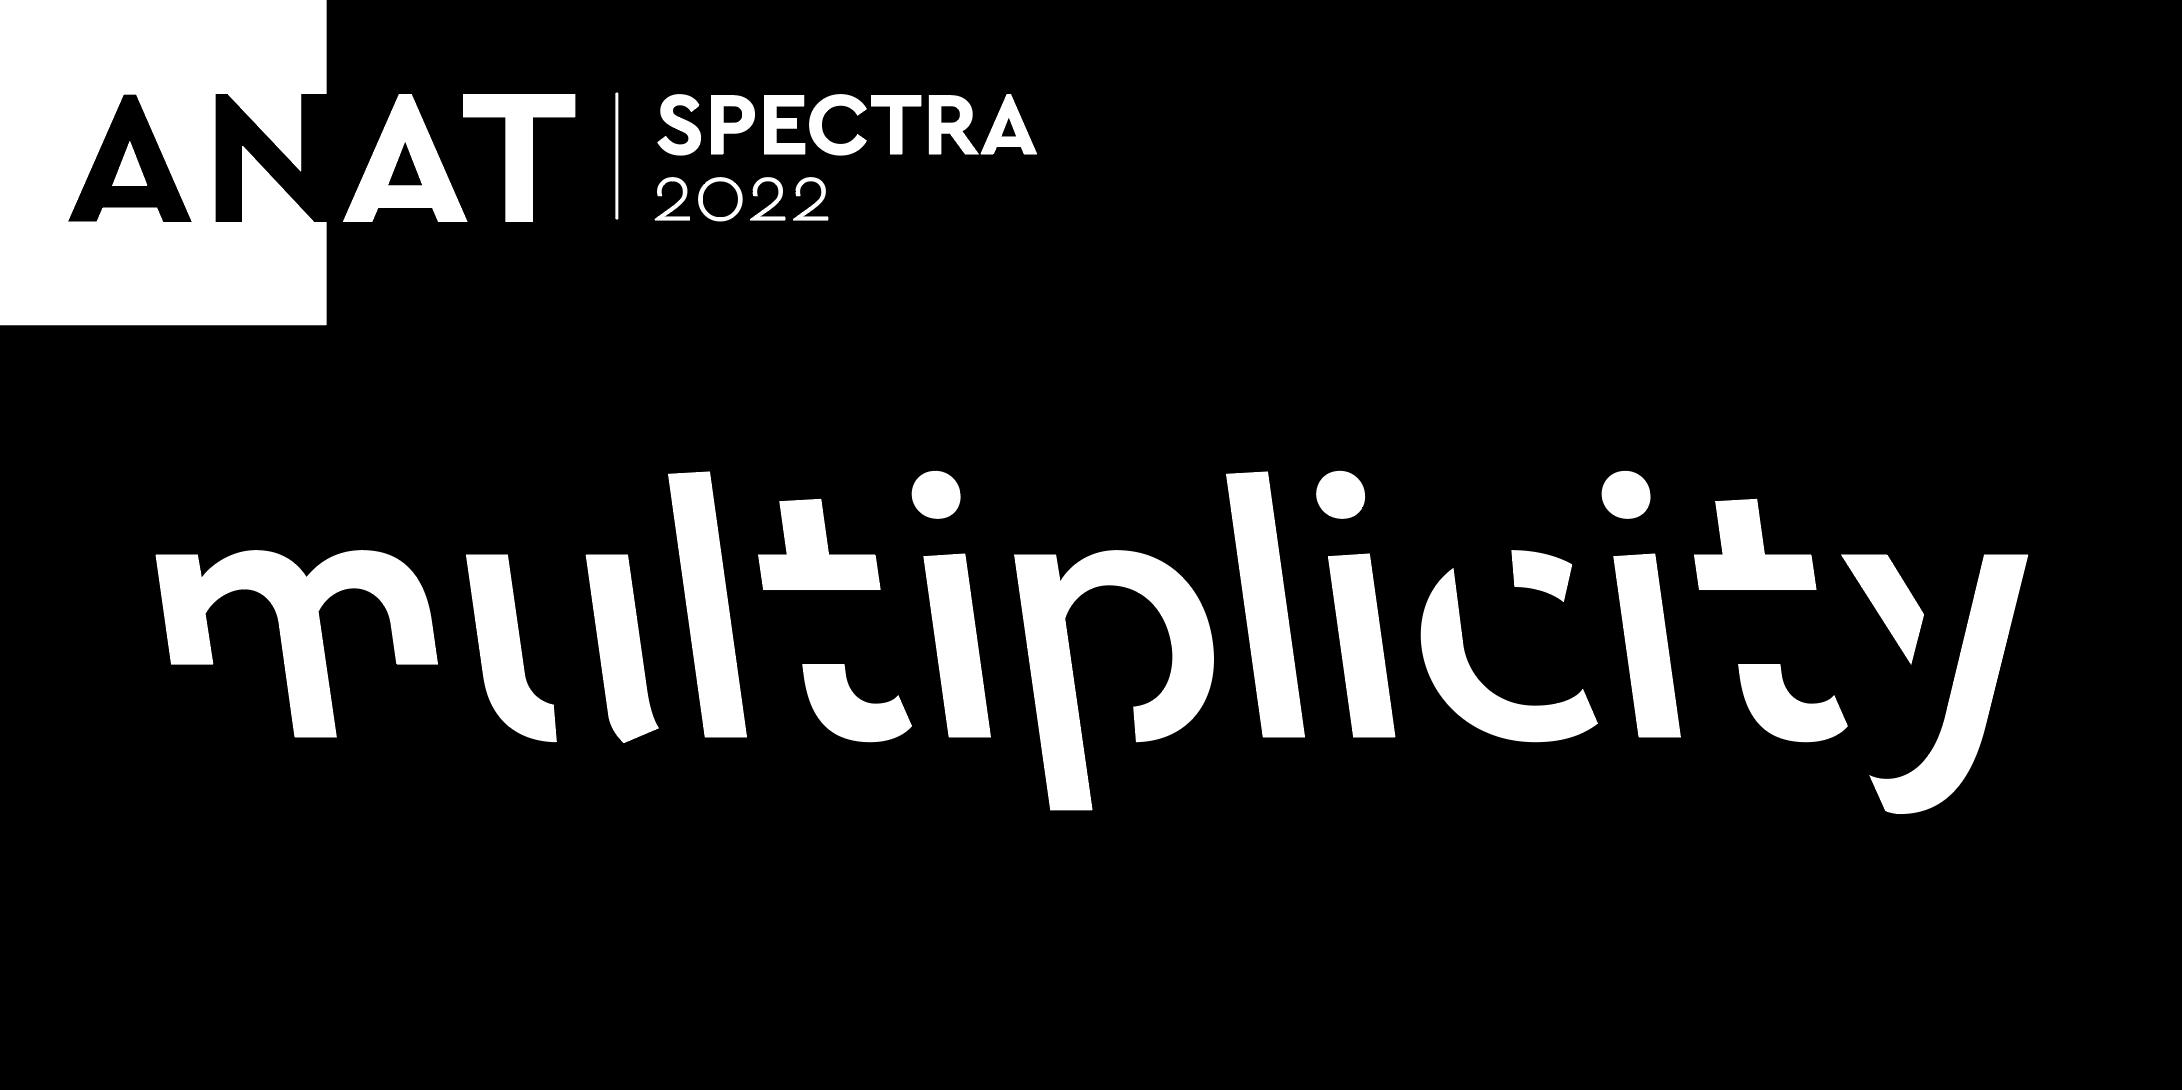 ANAT SPECTRA 2022 branding on a black background